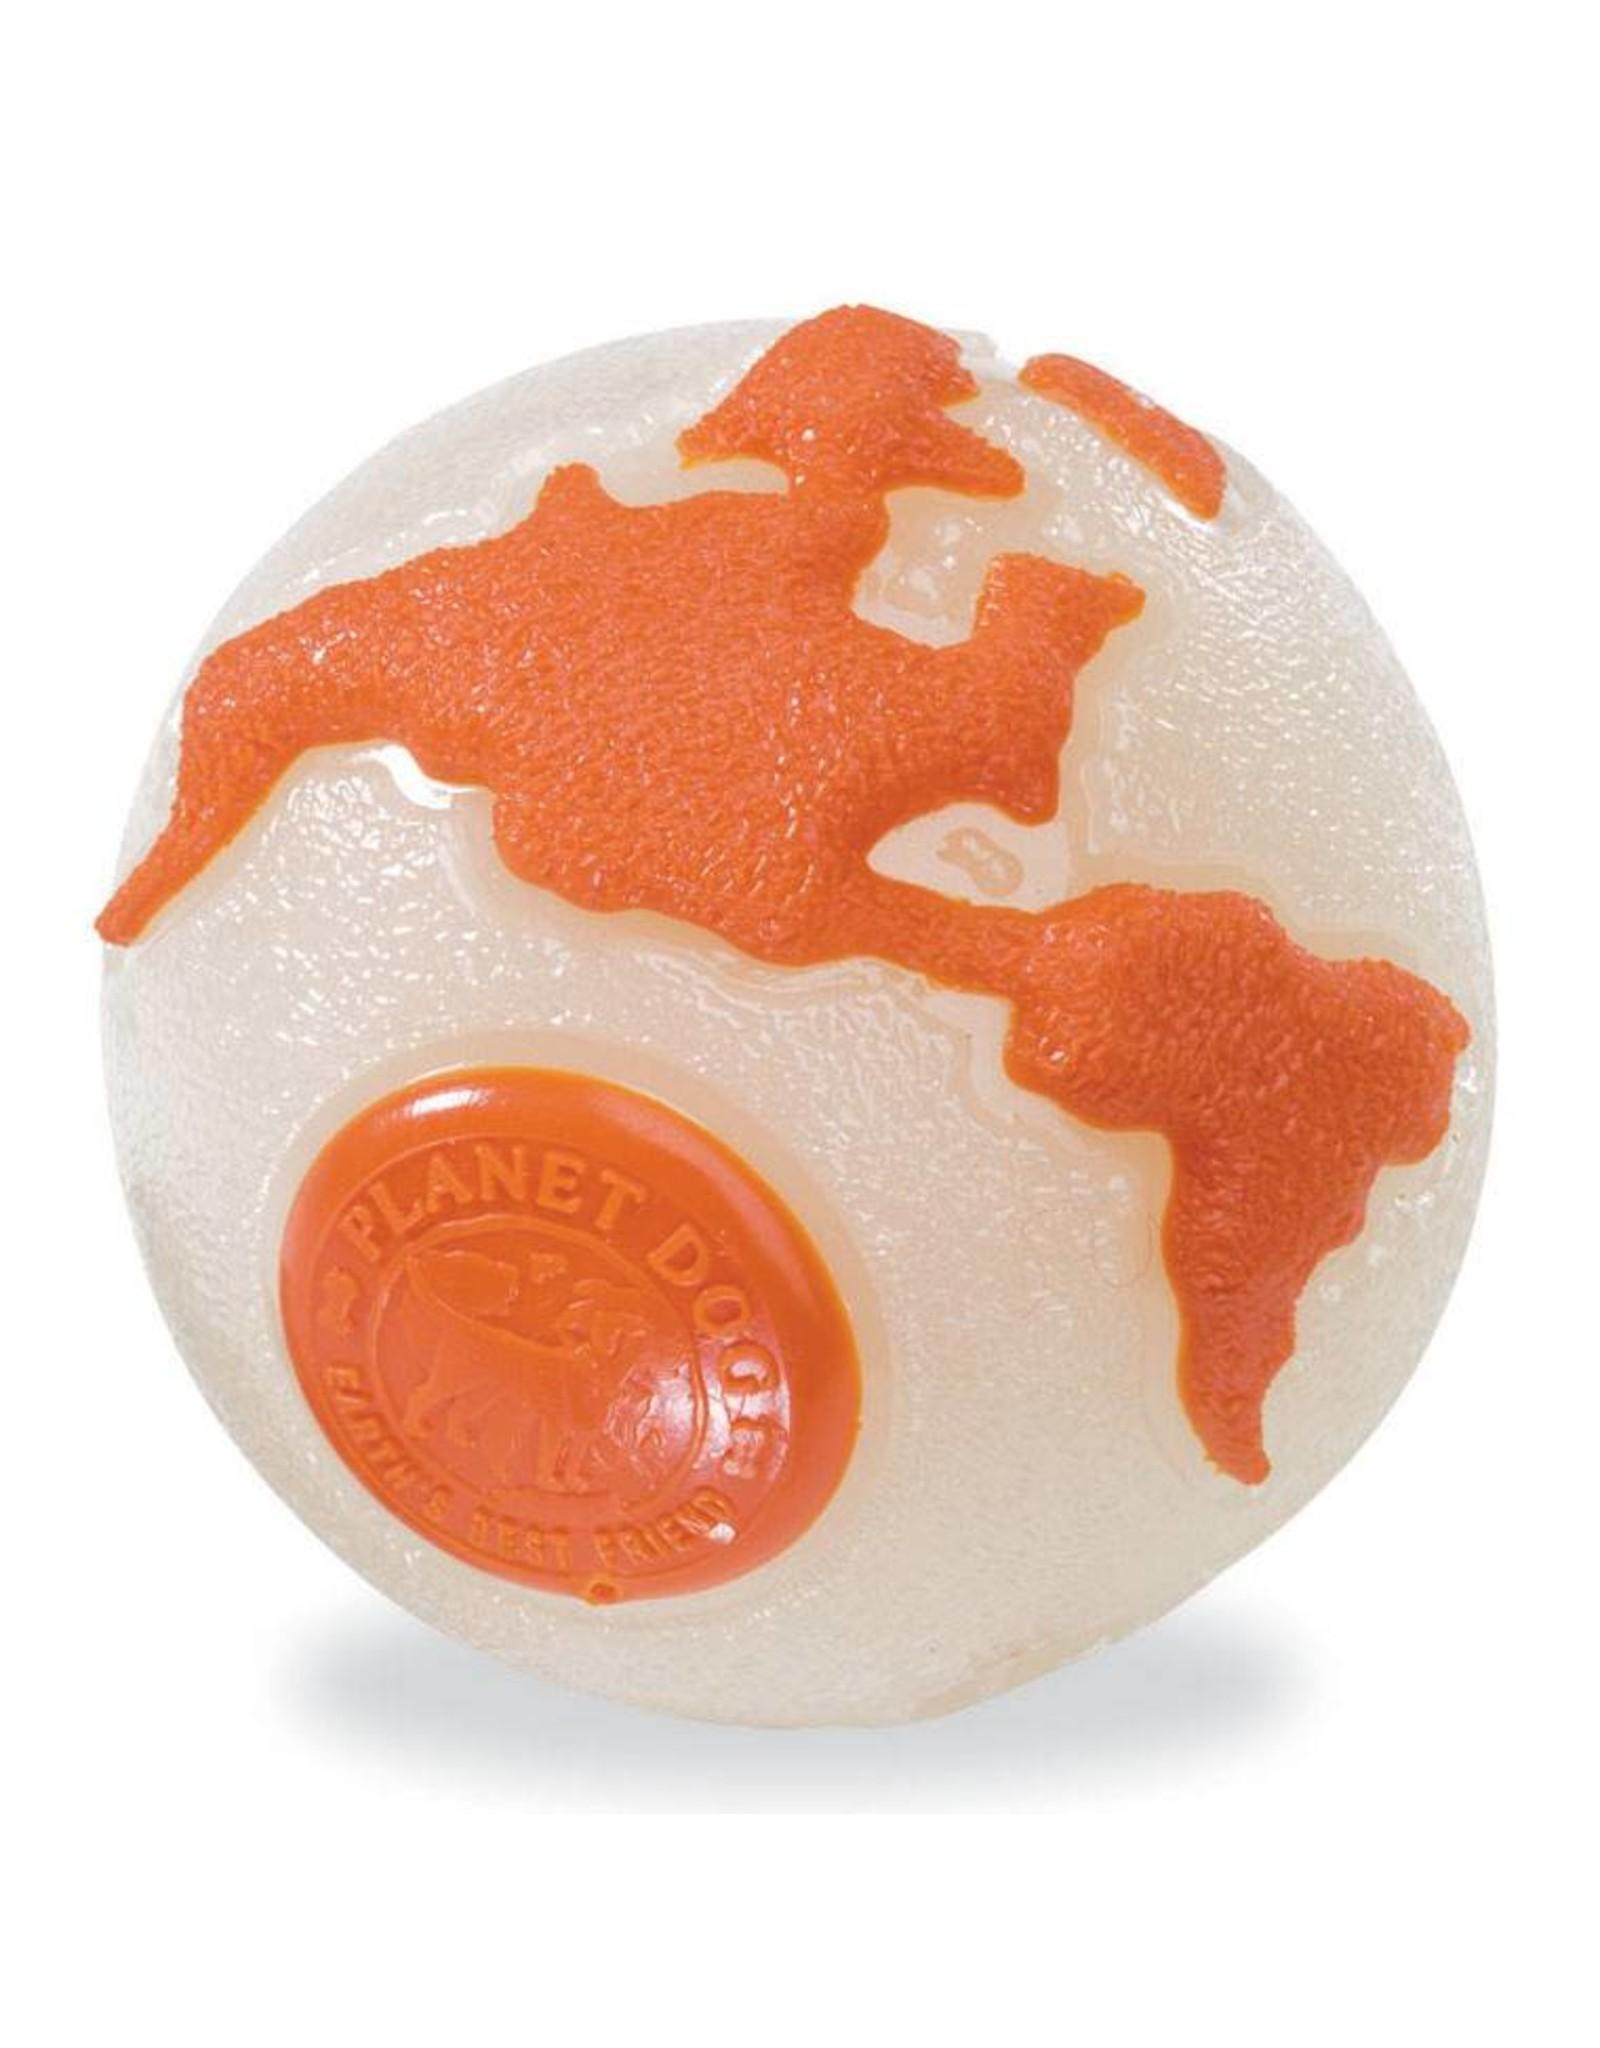 Orbee Ball